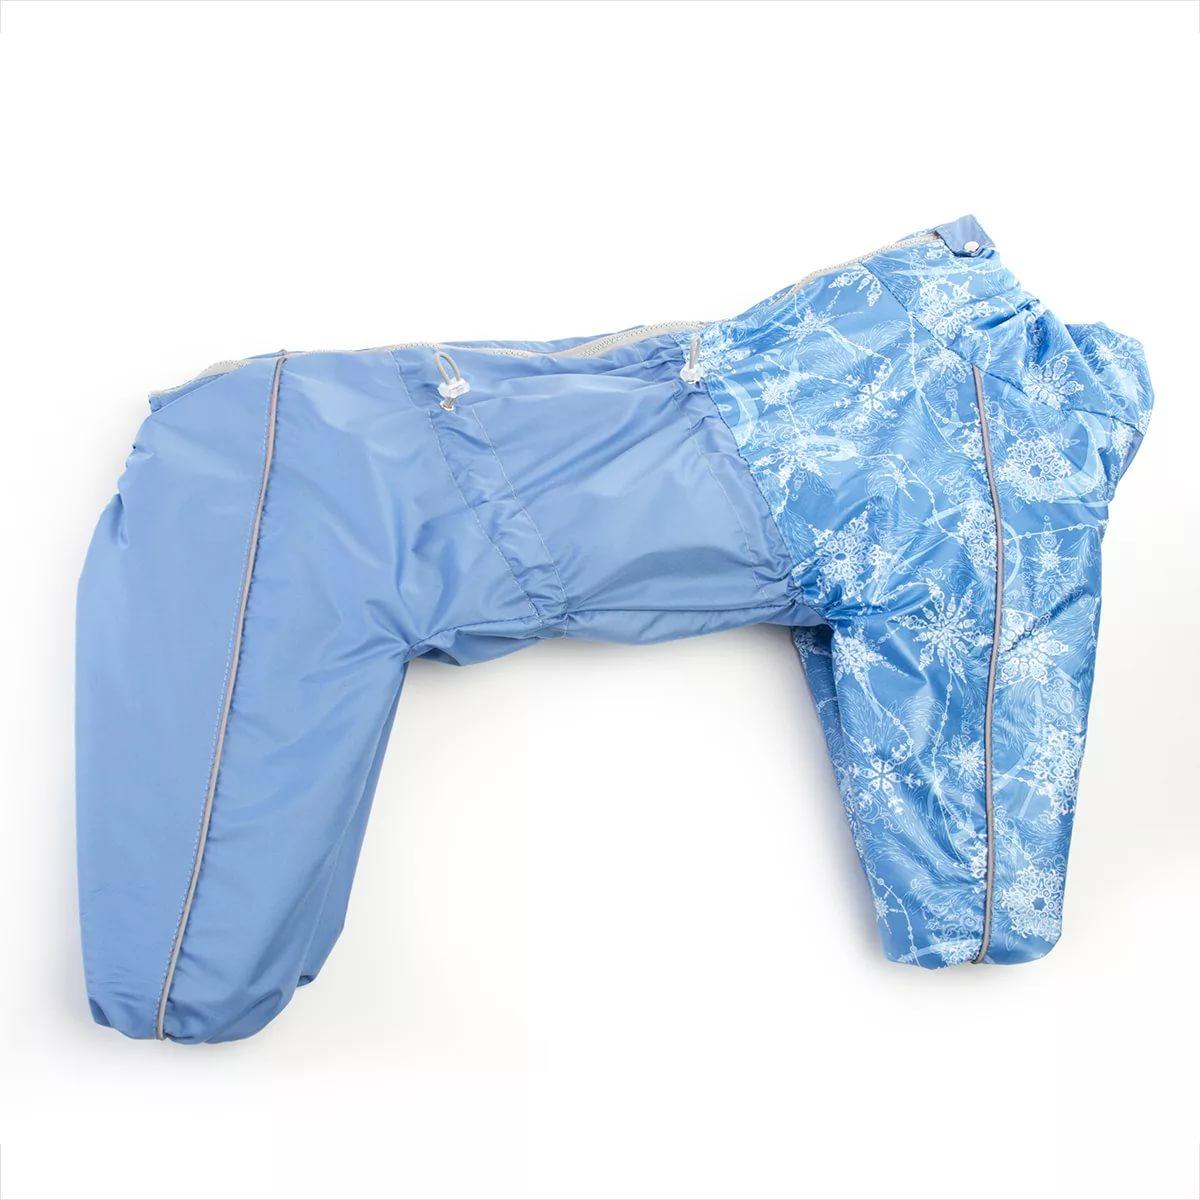 Комбинезон для собак OSSO Fashion размер S женский, голубой, длина спины 45 см